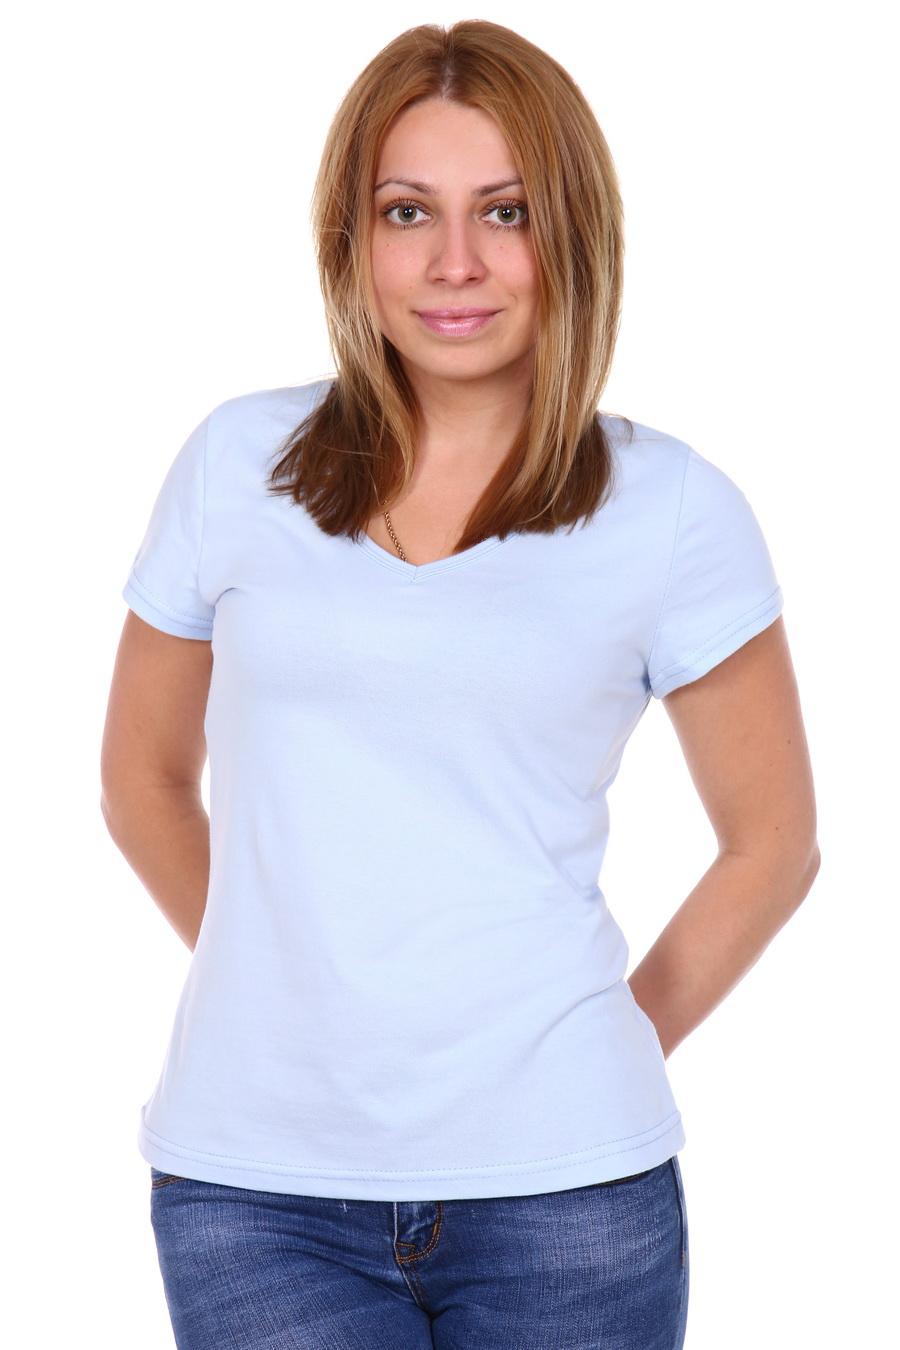 Жен. футболка арт. 17-0144 Голубой р. 46